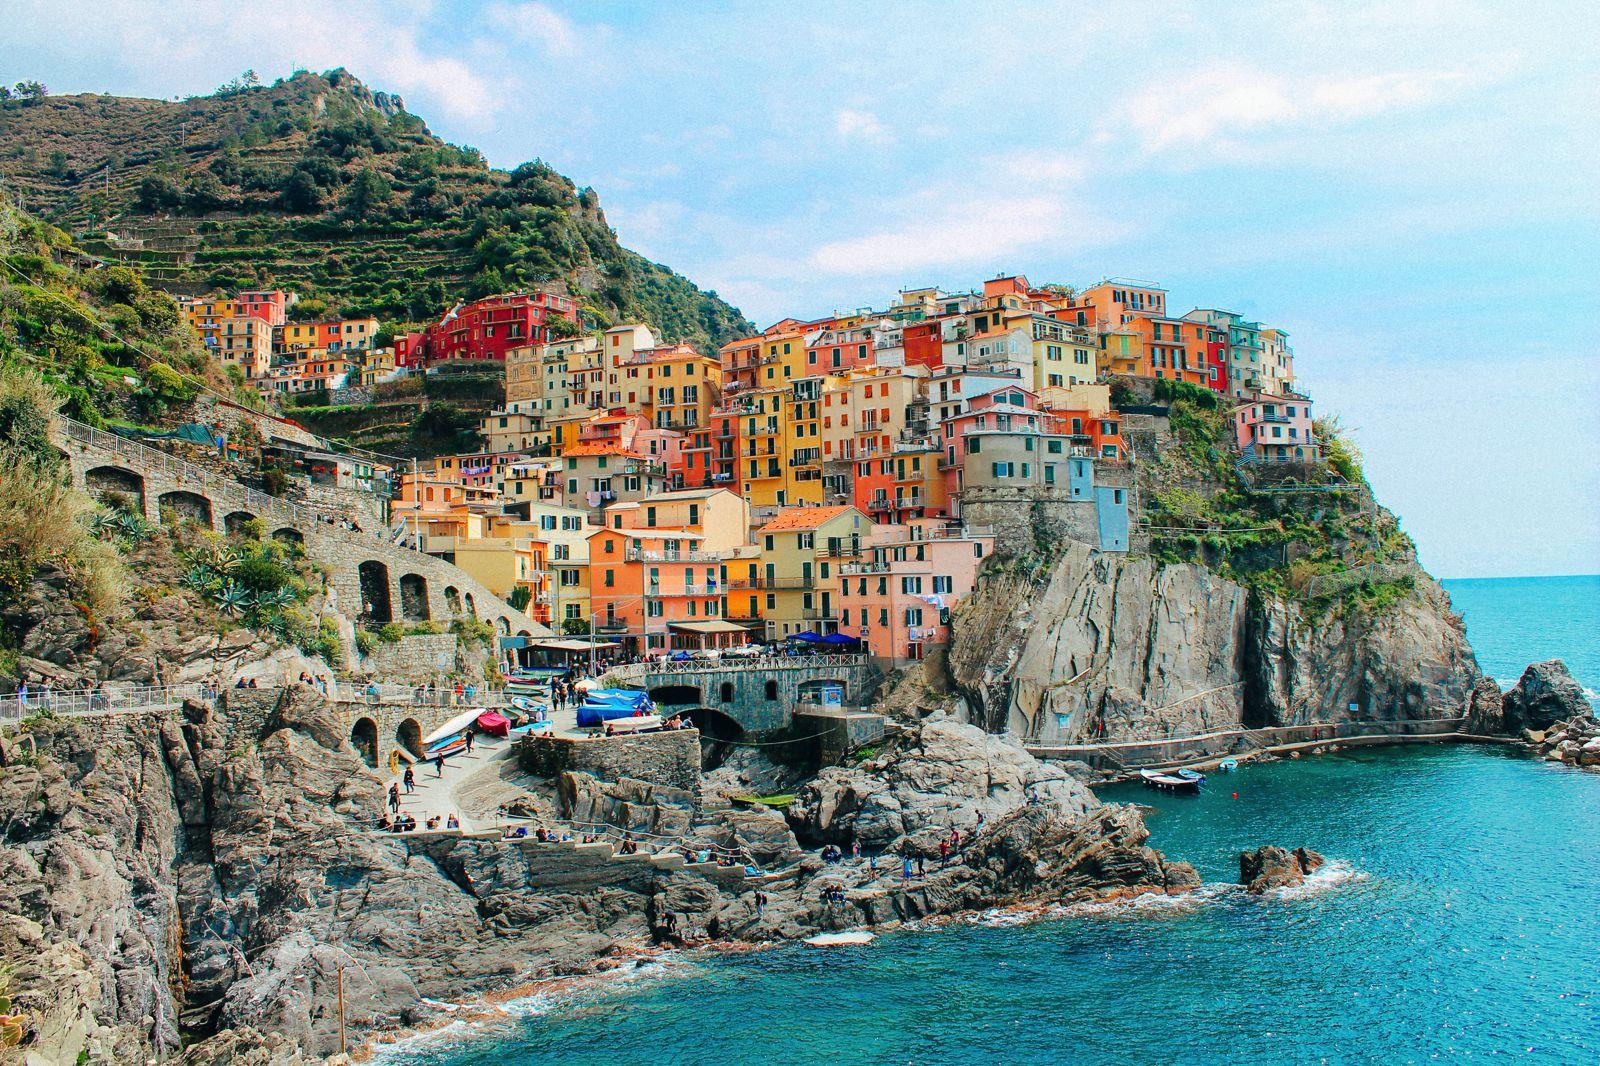 Manarola in Cinque Terre, Italy - The Photo Diary! [2 of 5] (9)